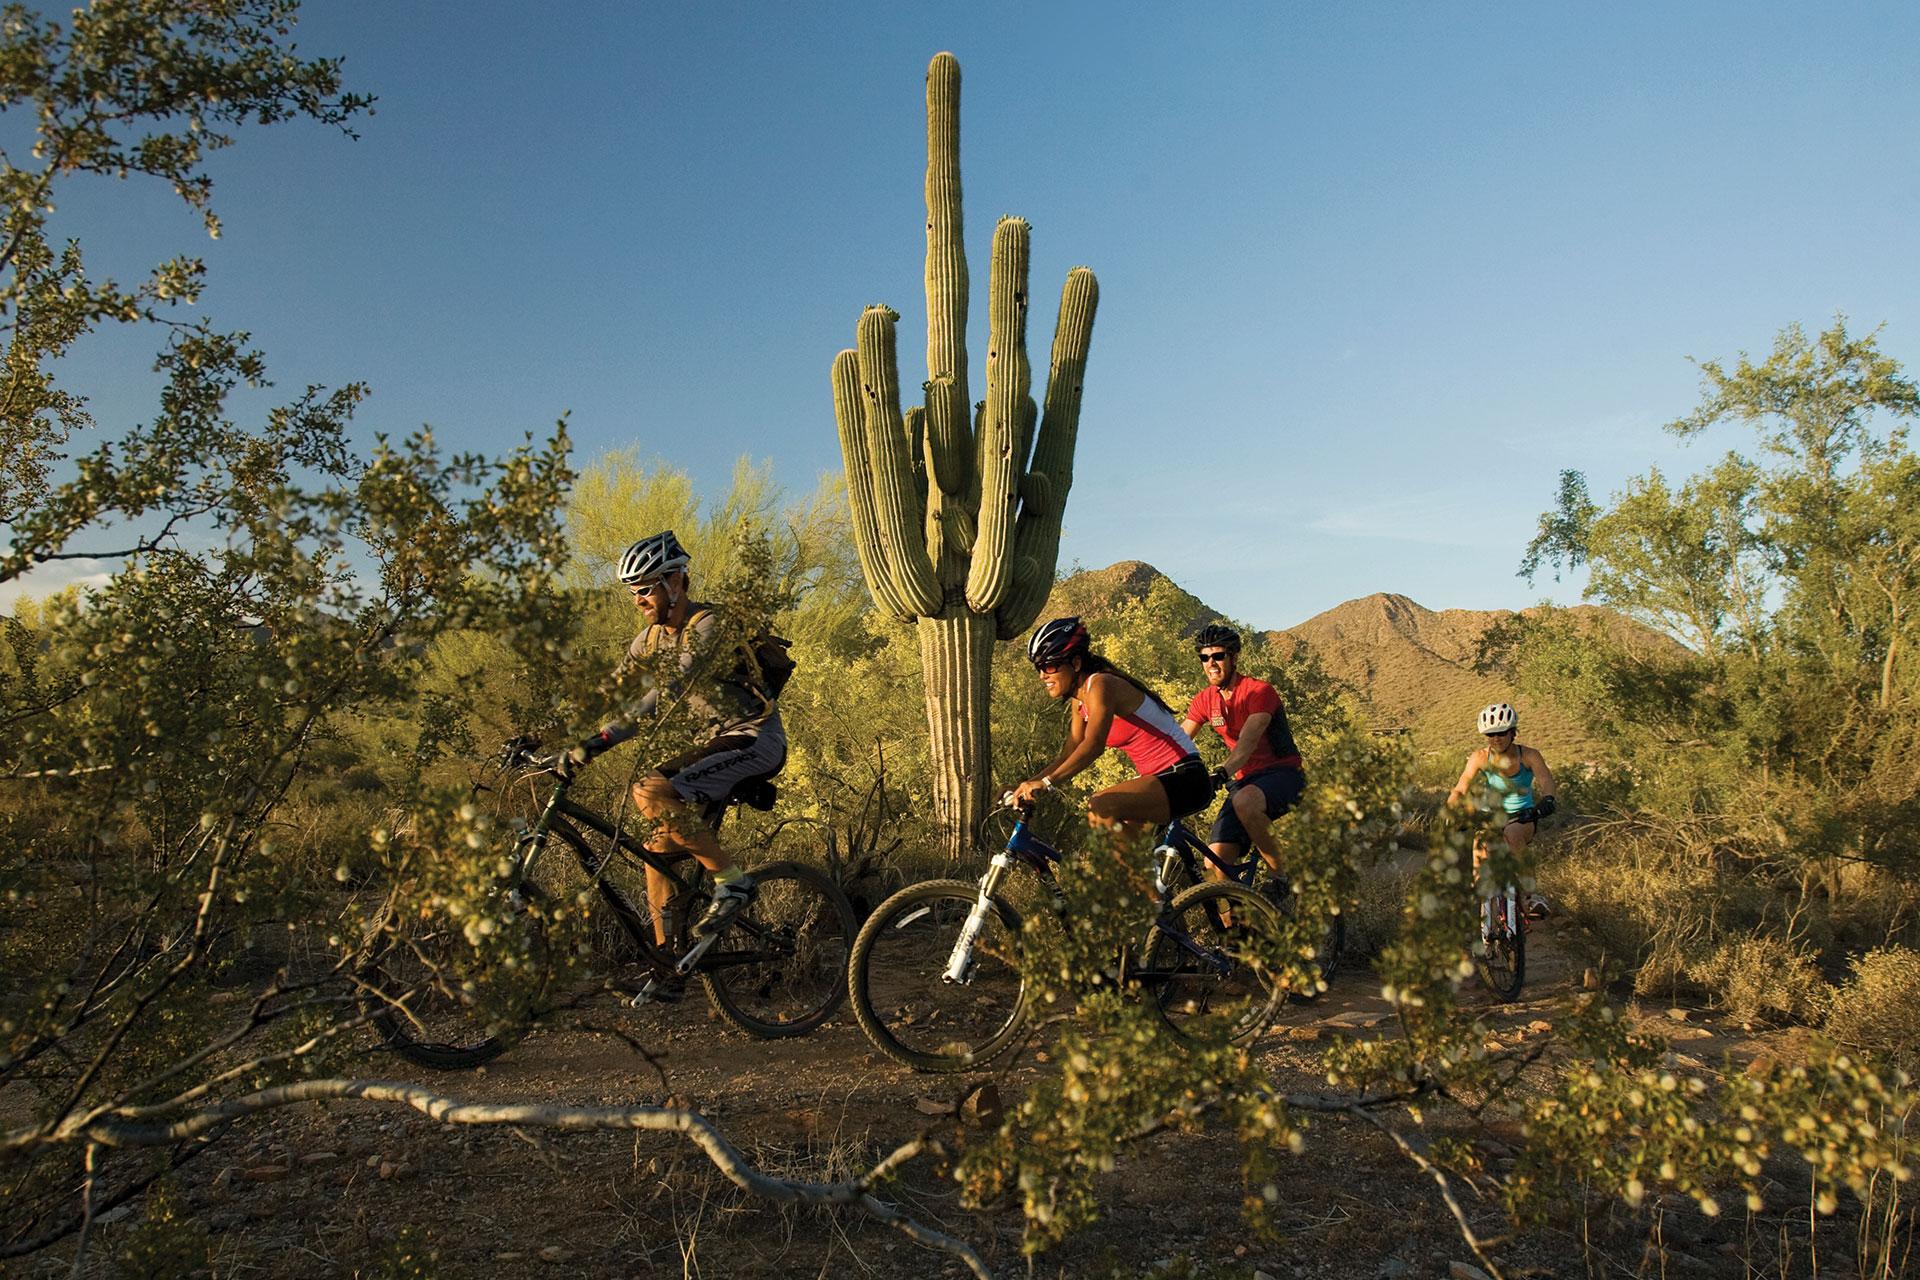 McDowell Sonoran Preserve in Phoenix